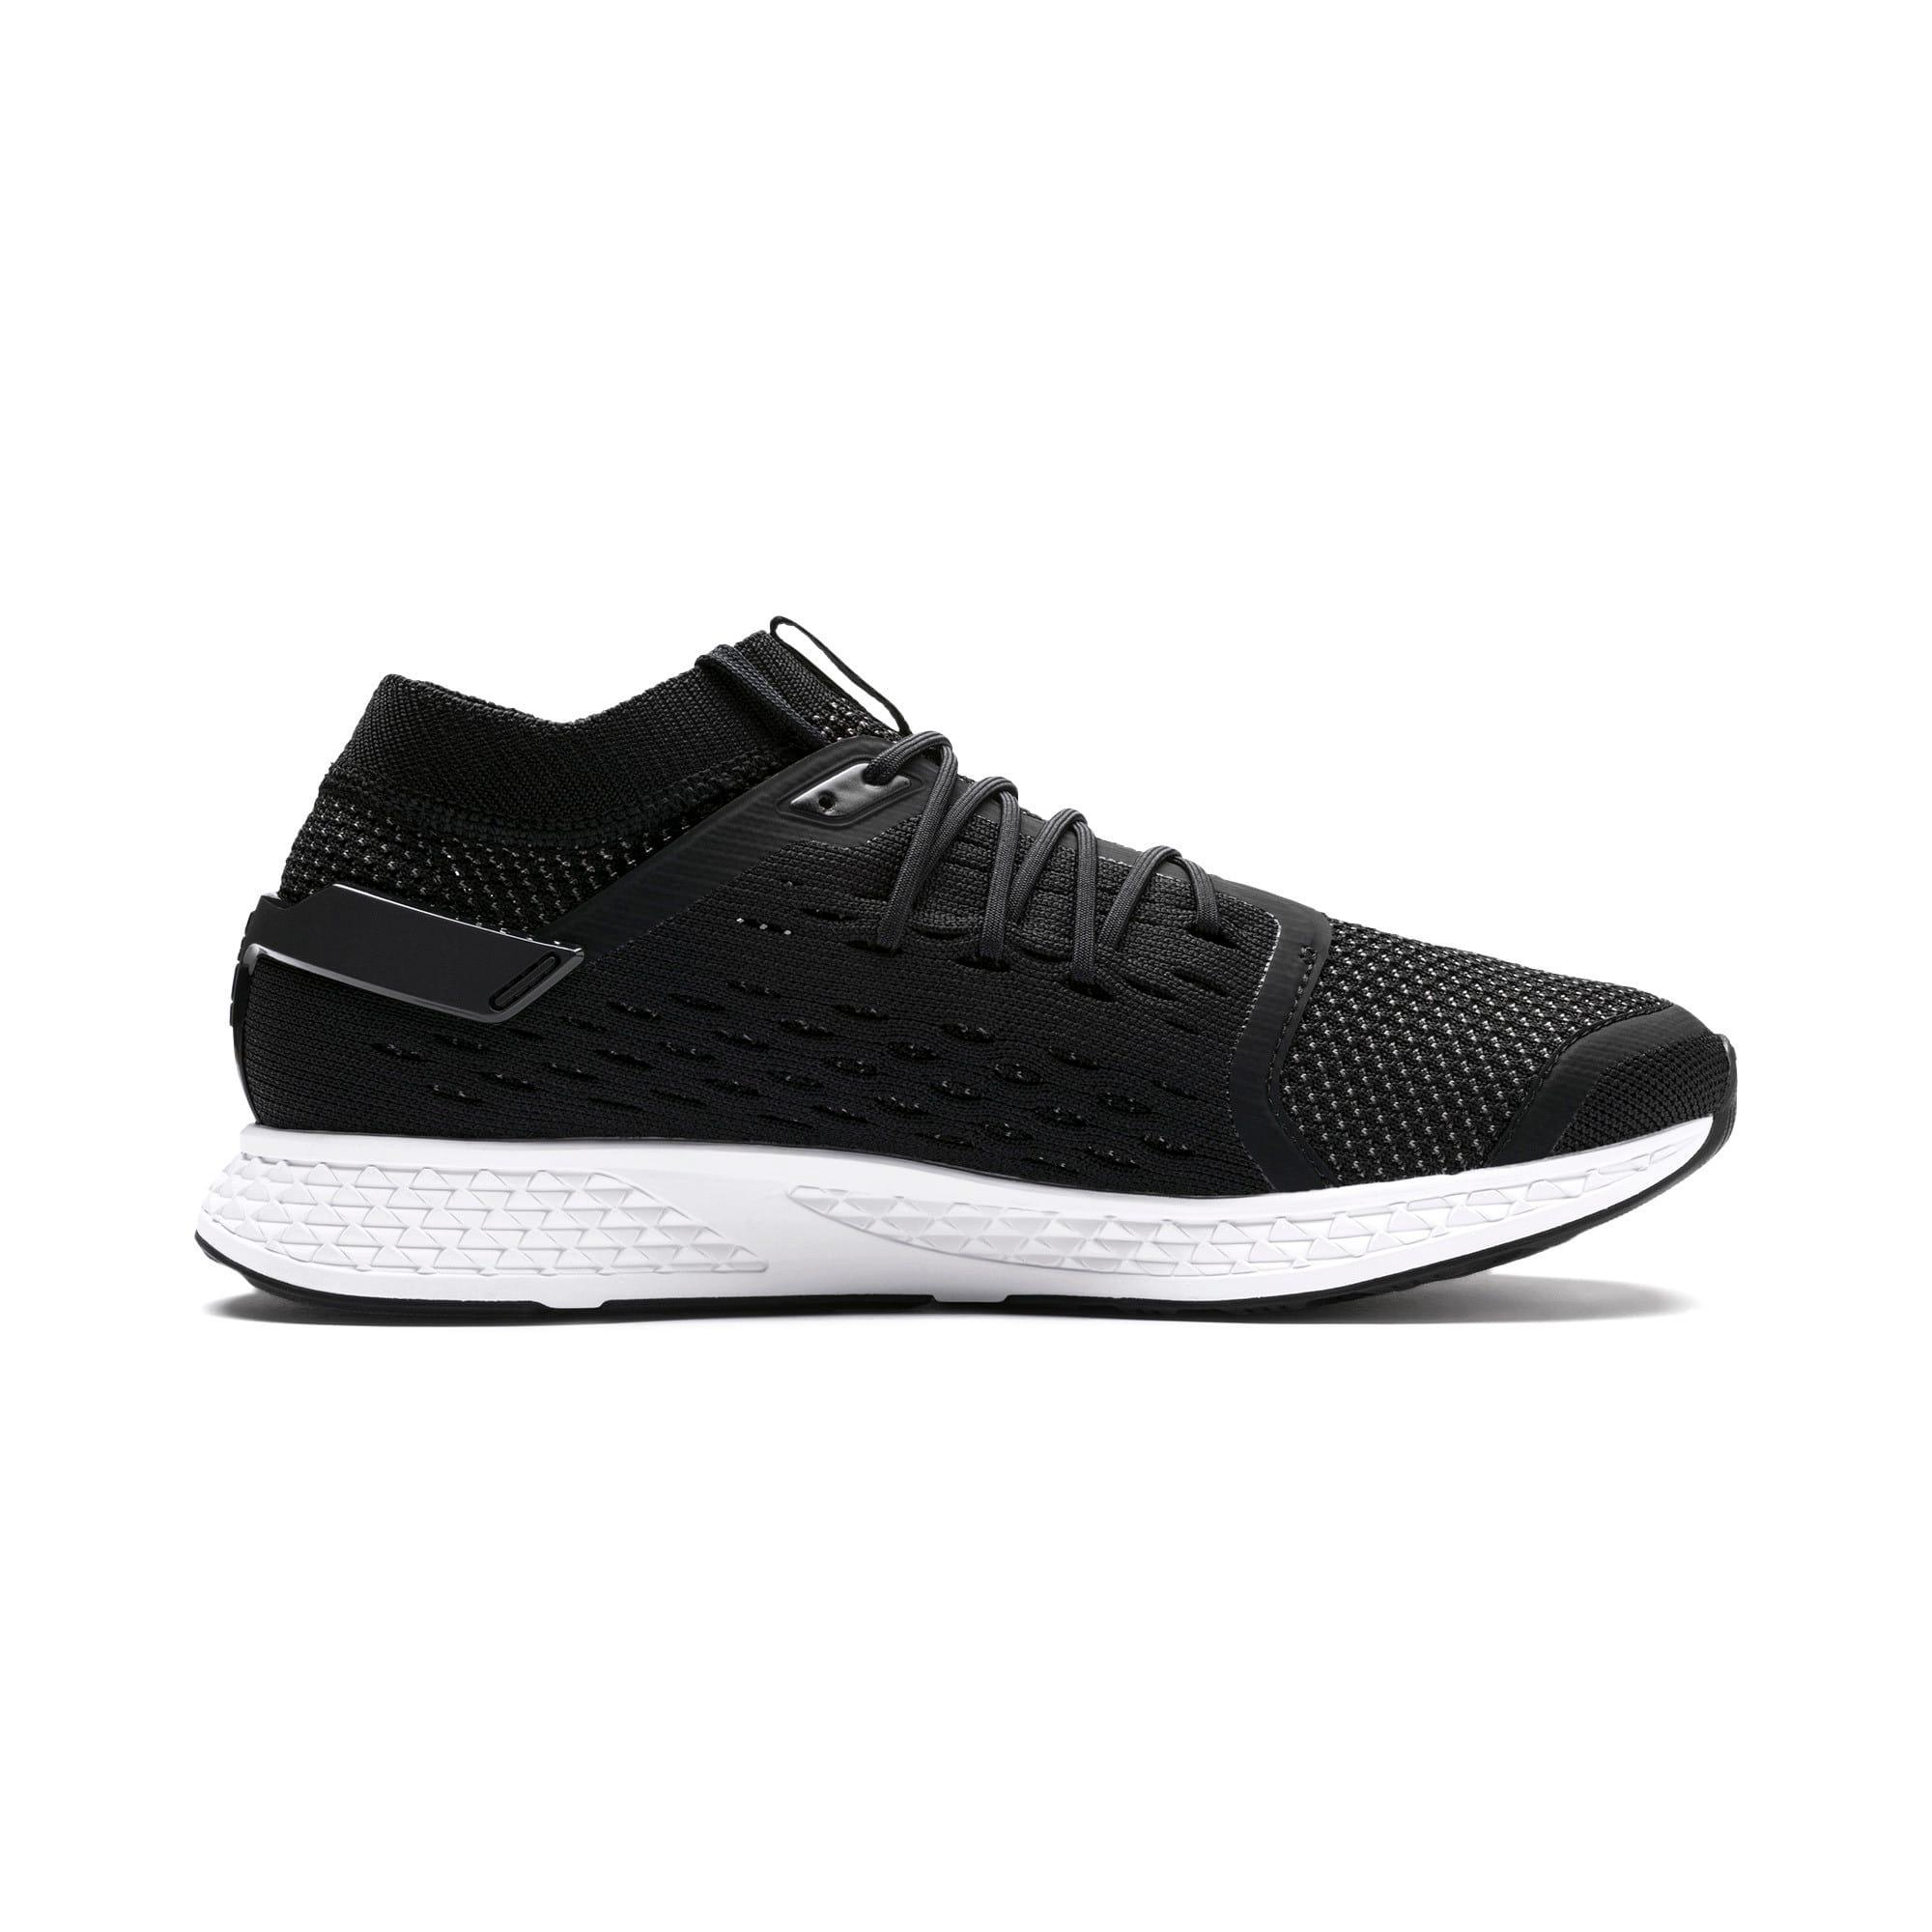 Thumbnail 6 of SPEED 500 Men's Running Shoes, Puma Black-Puma White, medium